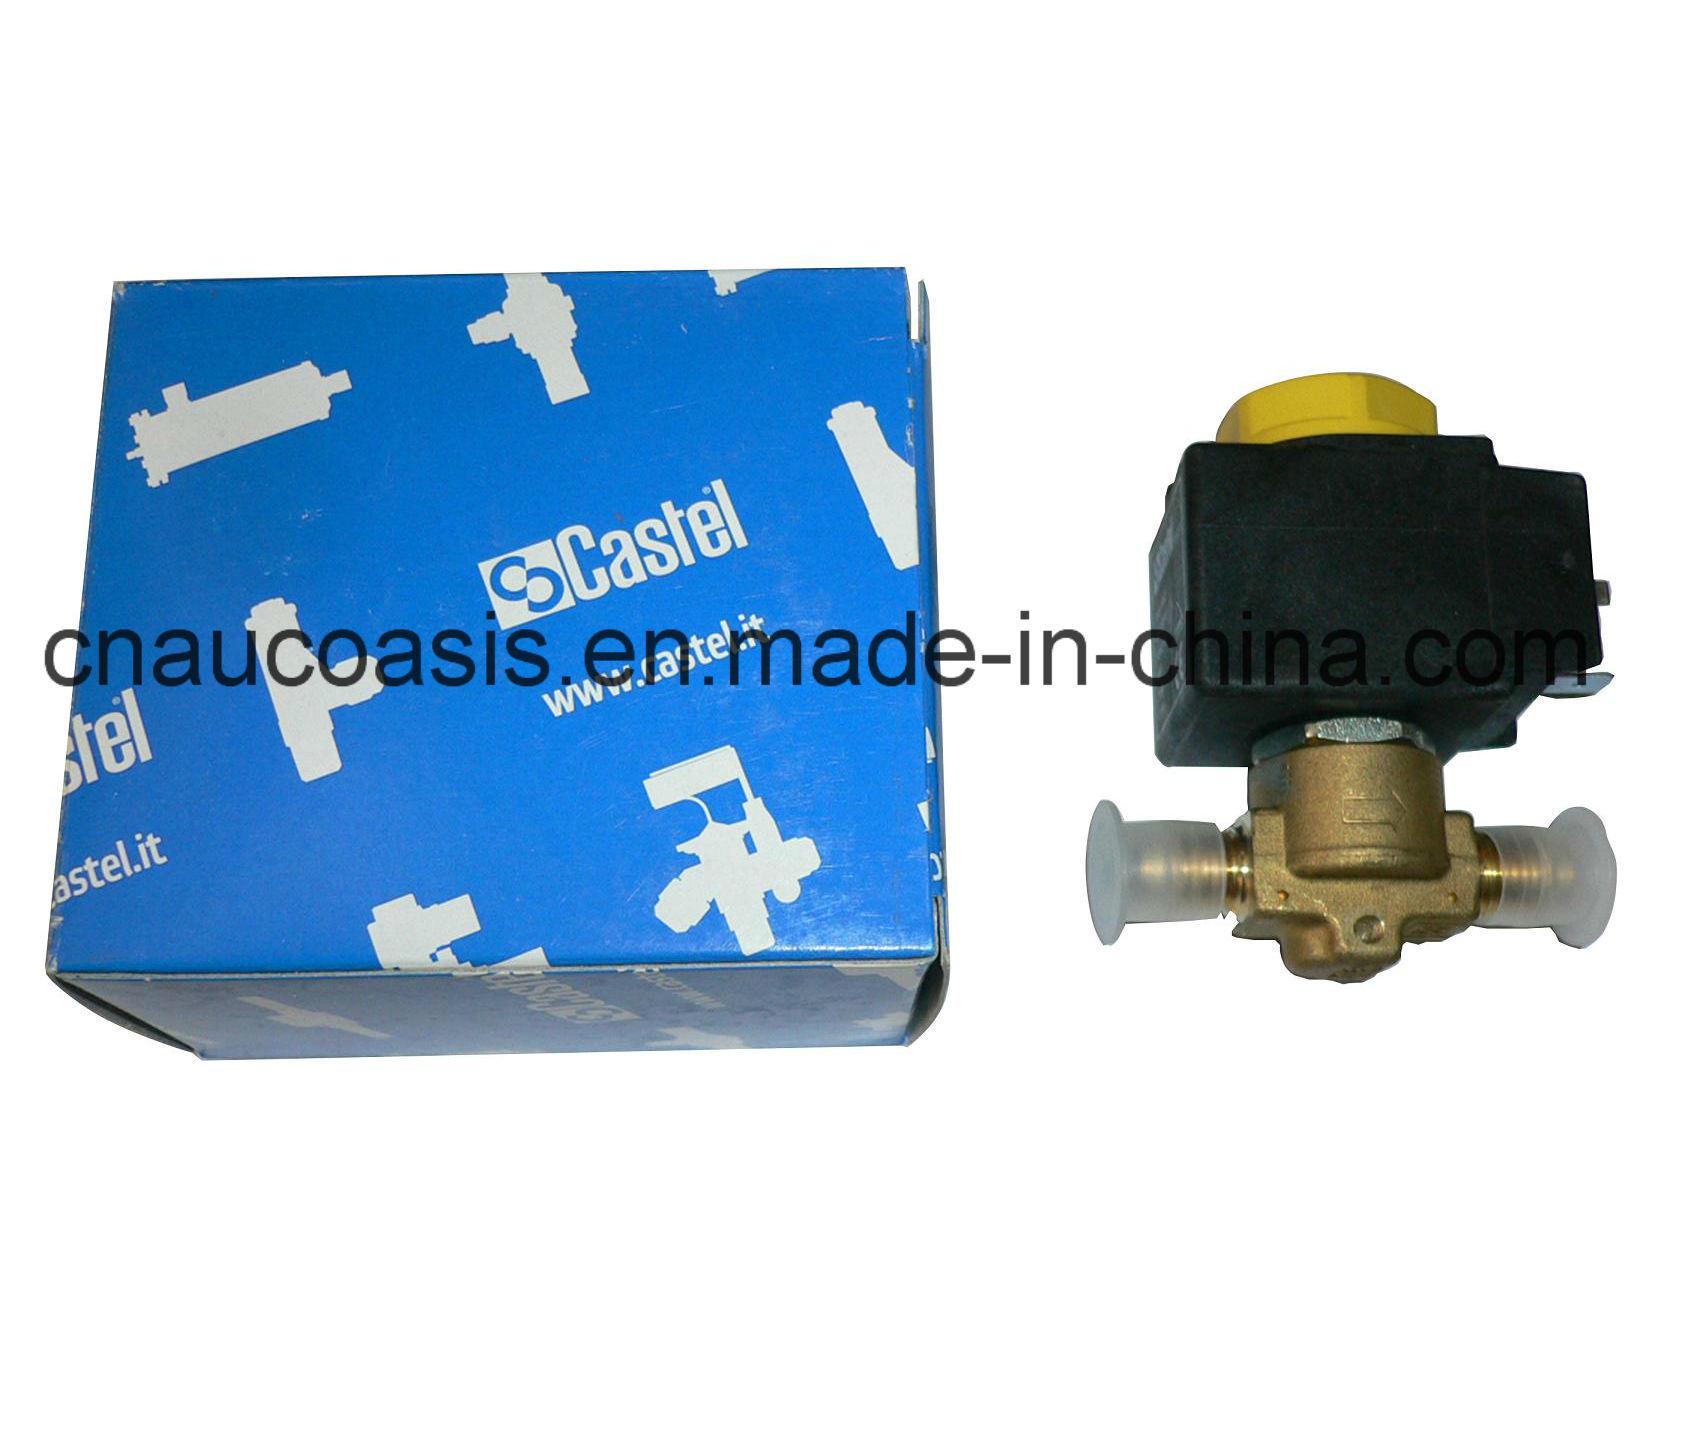 1068/4A6 Castel Solenoid Valve for Refrigeration System Control